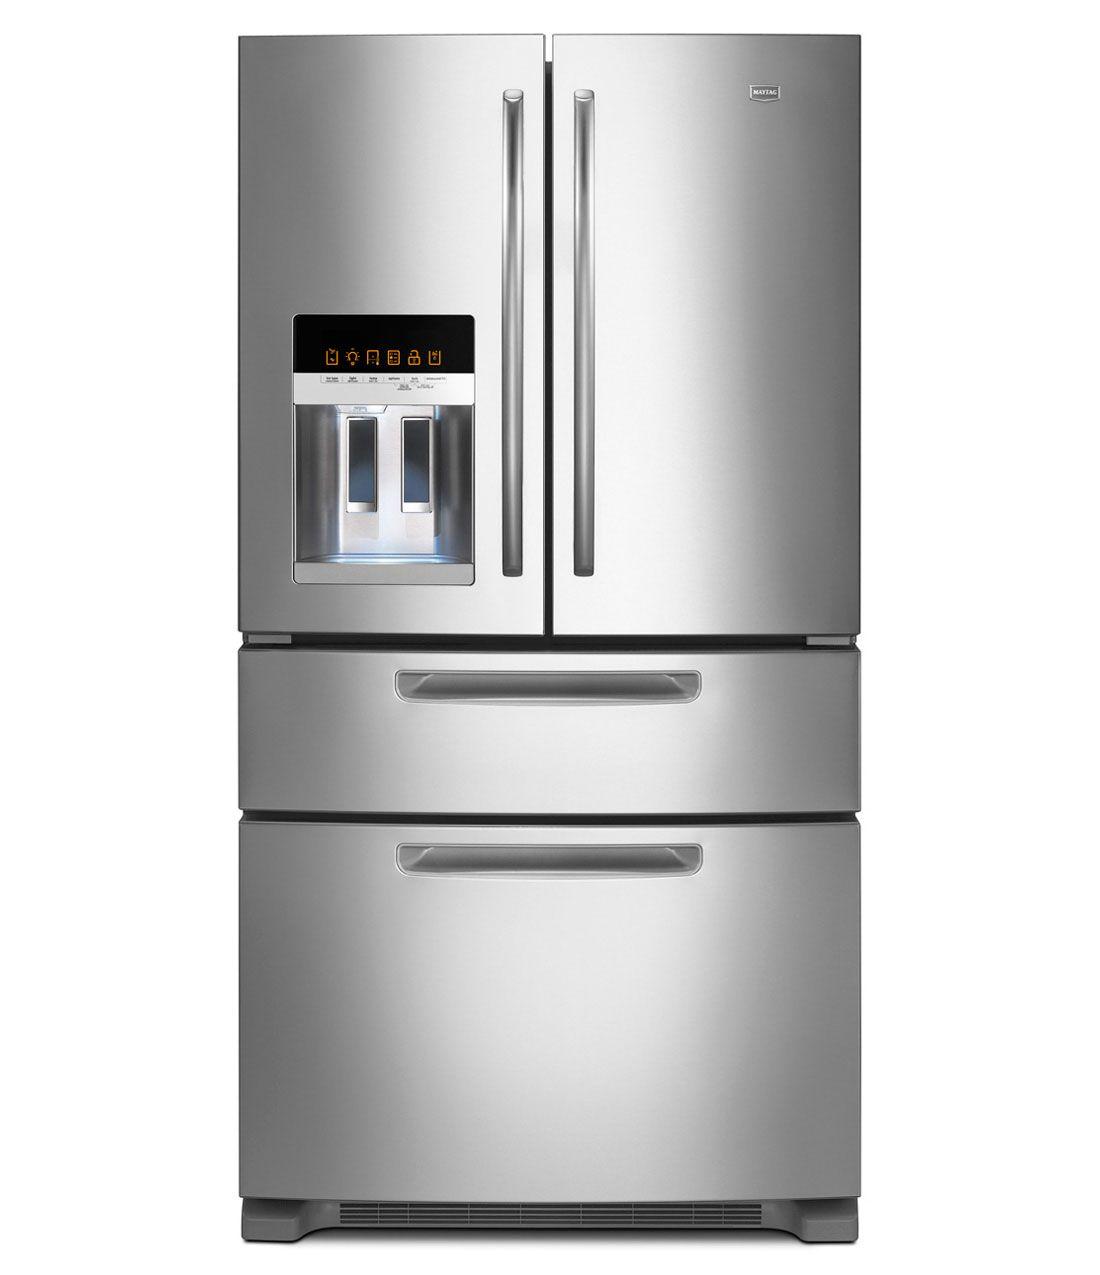 REFRIGERATORS +FRENCH DOORS+BOTTOM FREEZER | Ice2O-Maytag-Refrigerator-French Doors-Bottom Freezer